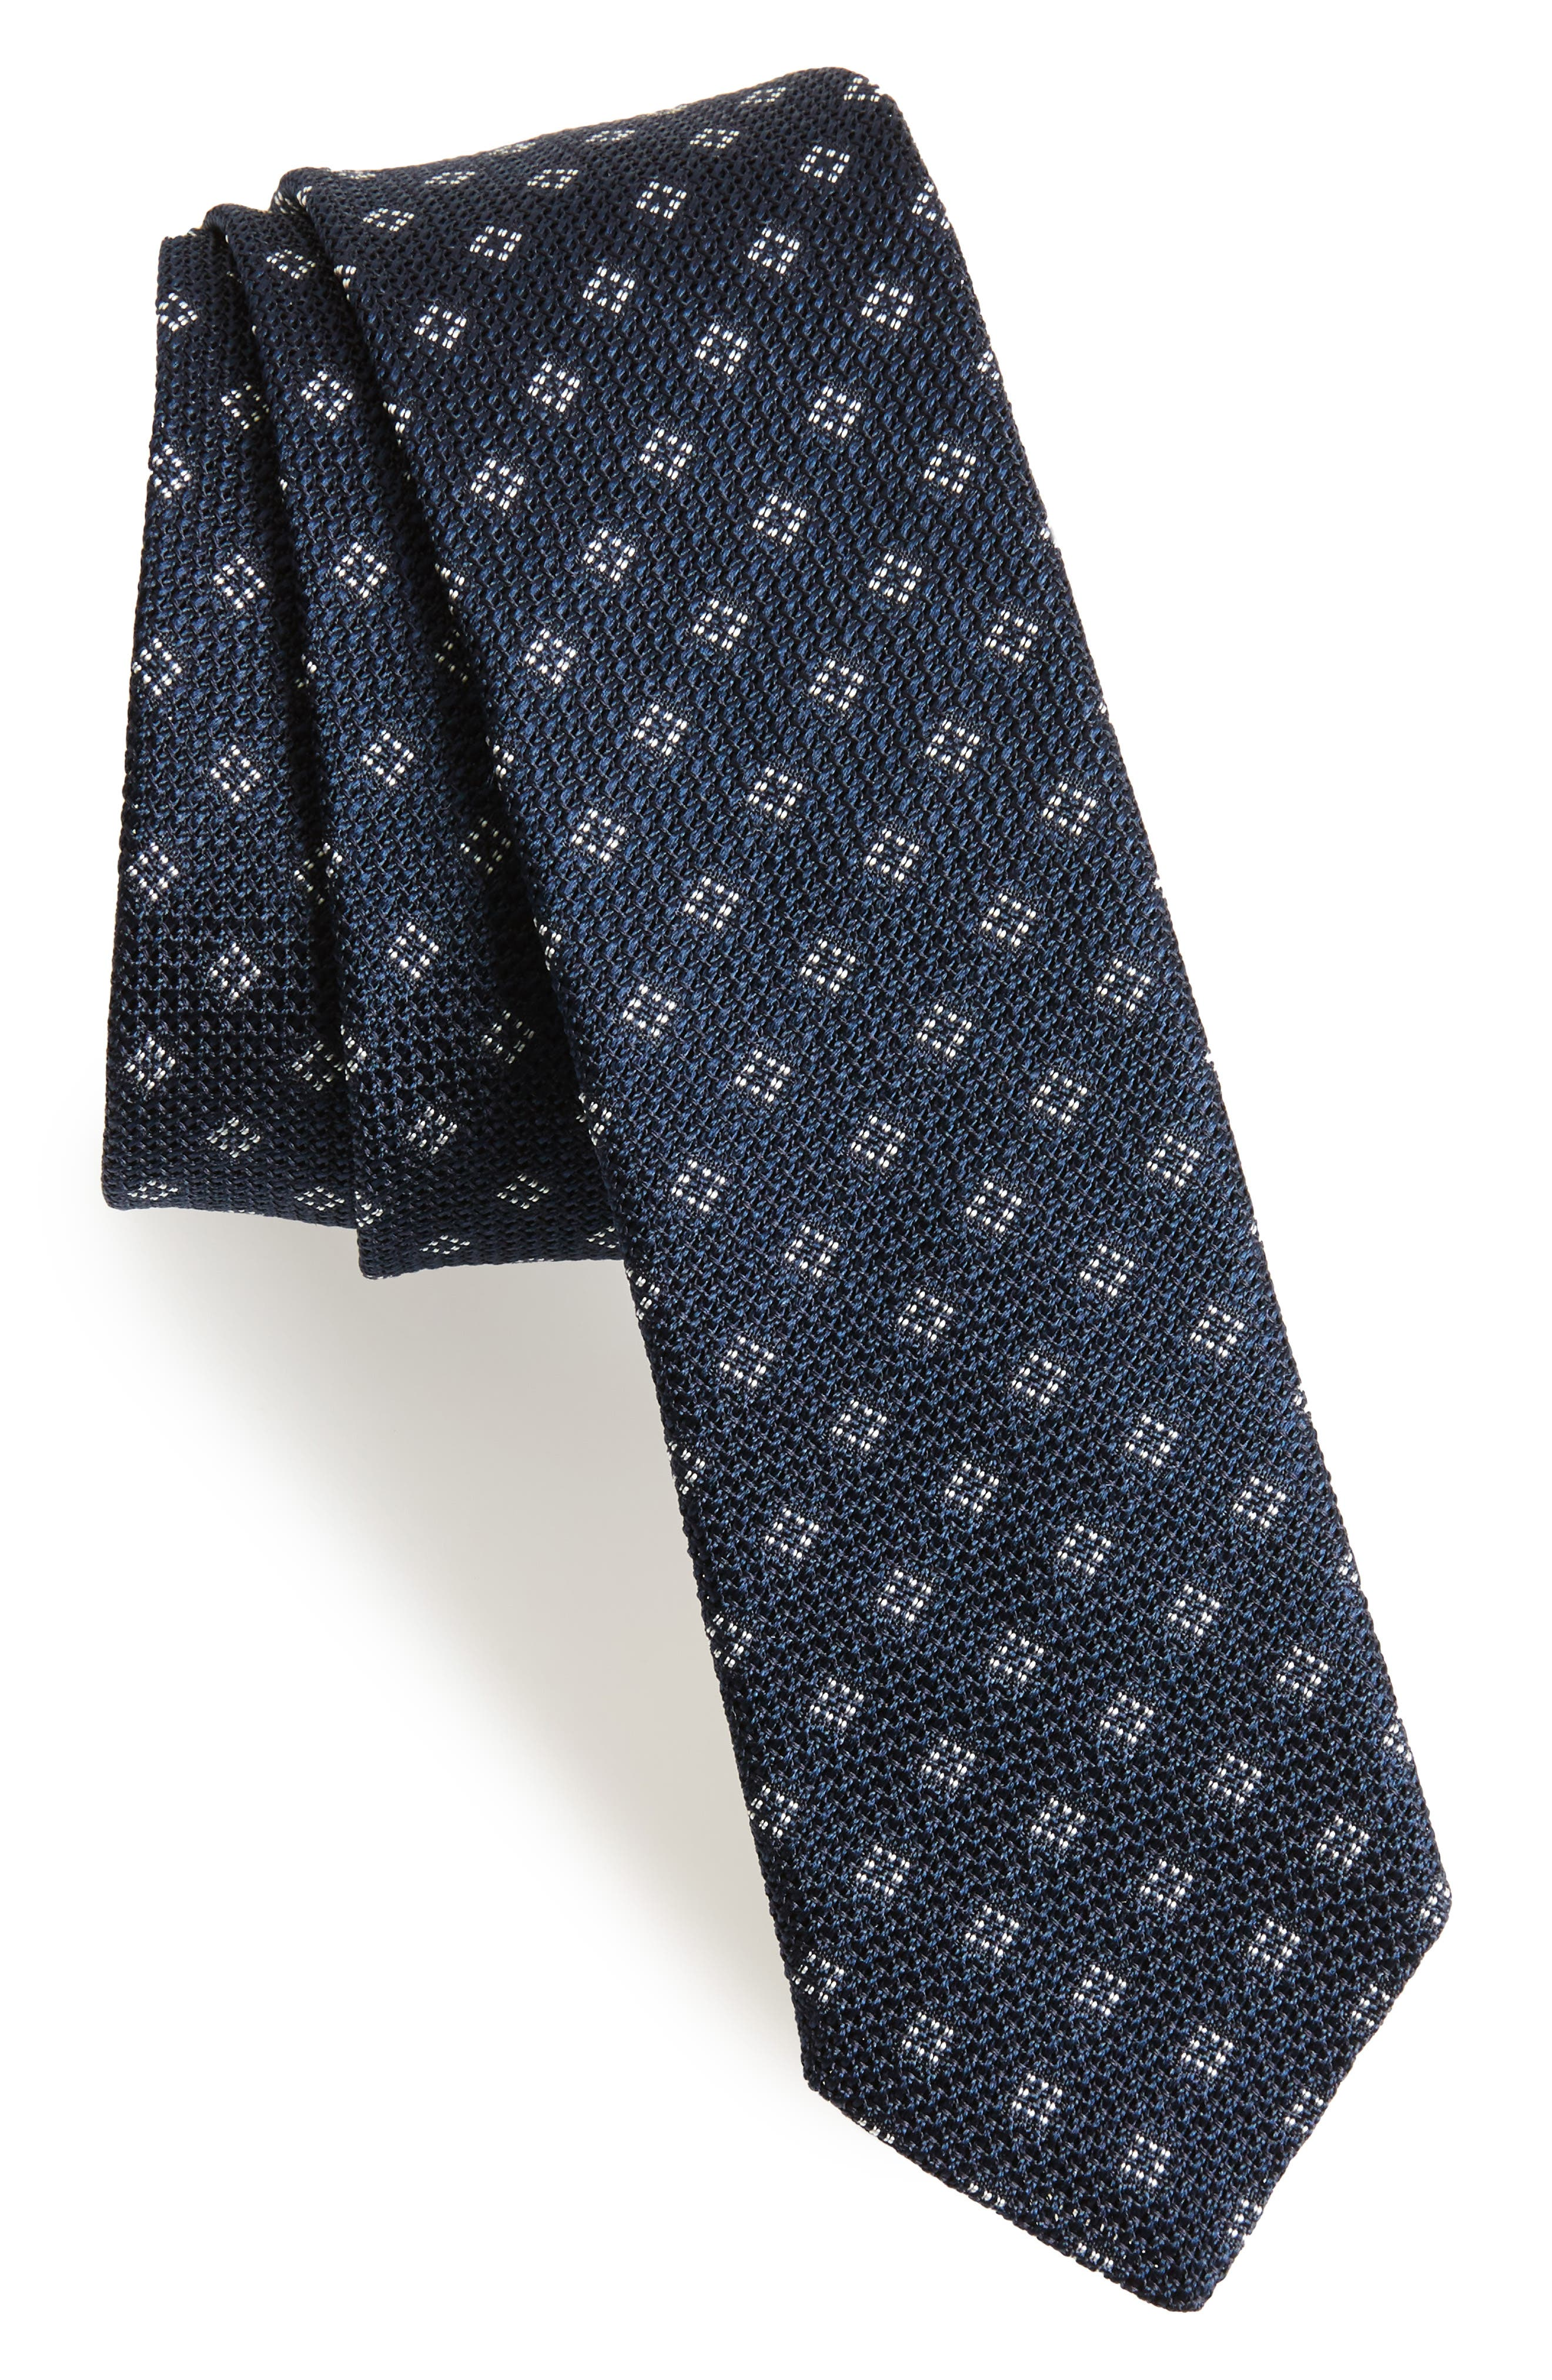 Alternate Image 1 Selected - Eleventy Medallion Silk Skinny Tie